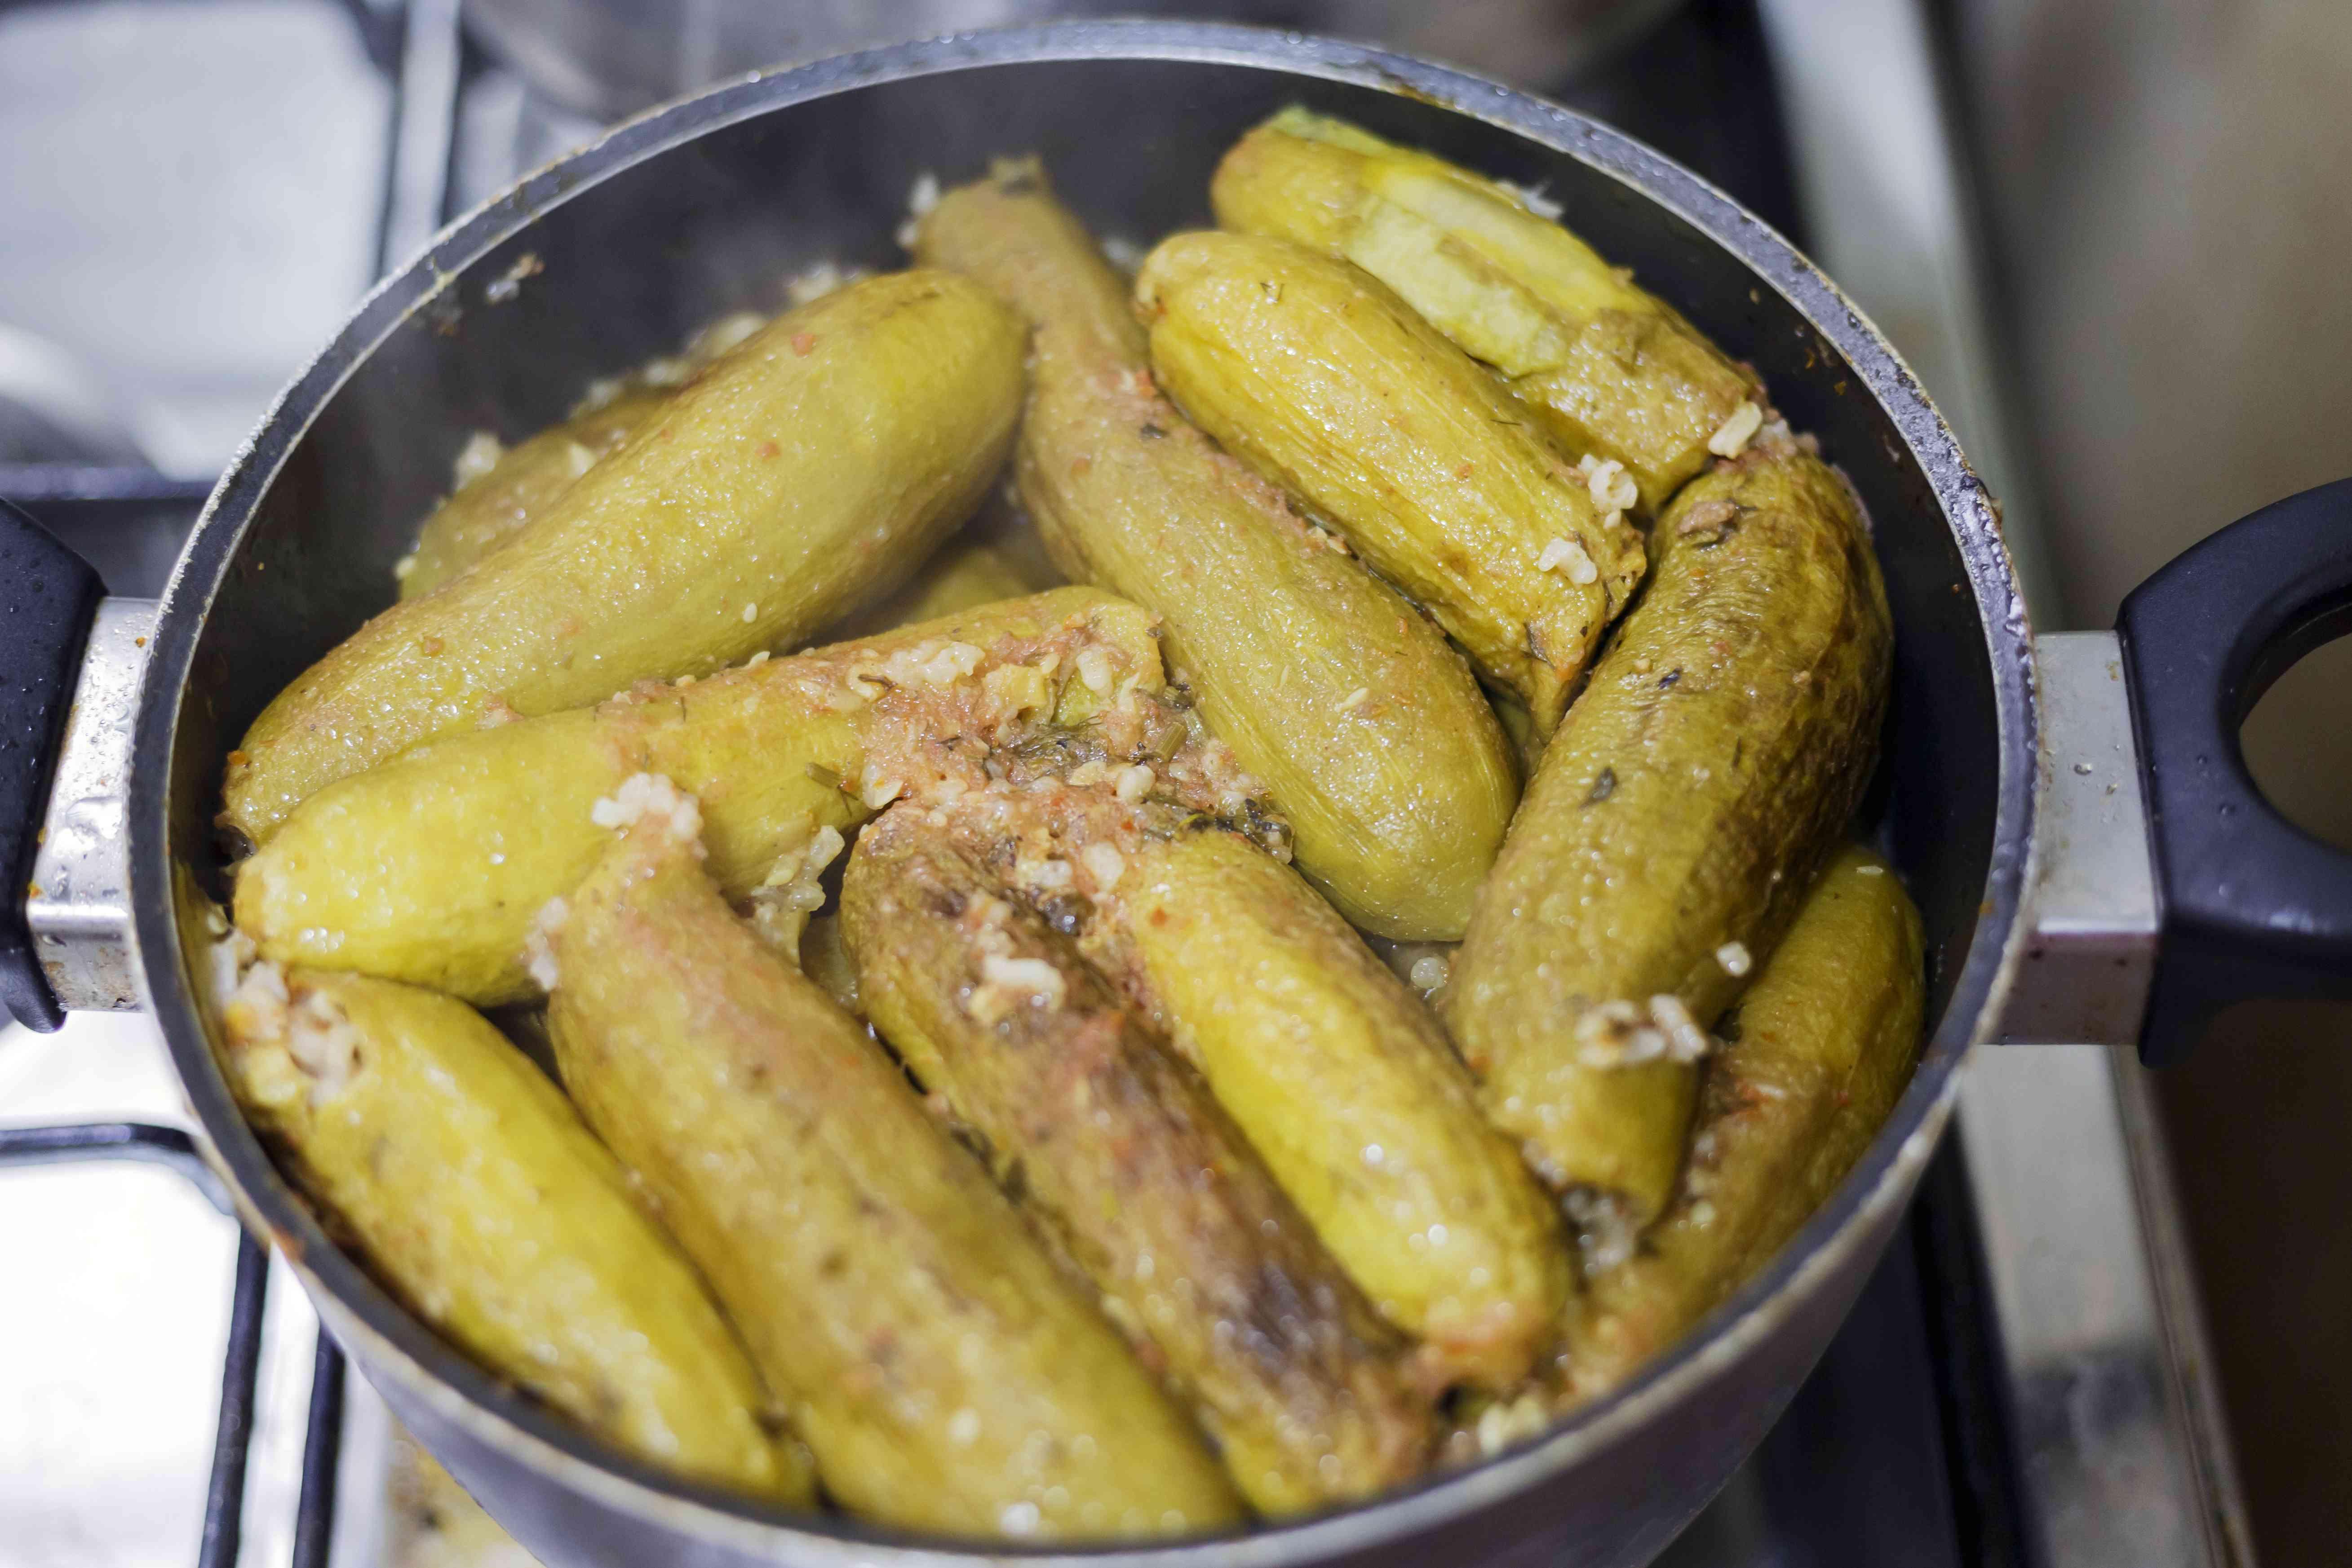 Stuffed zucchini (kousa mahshi) in cookware.